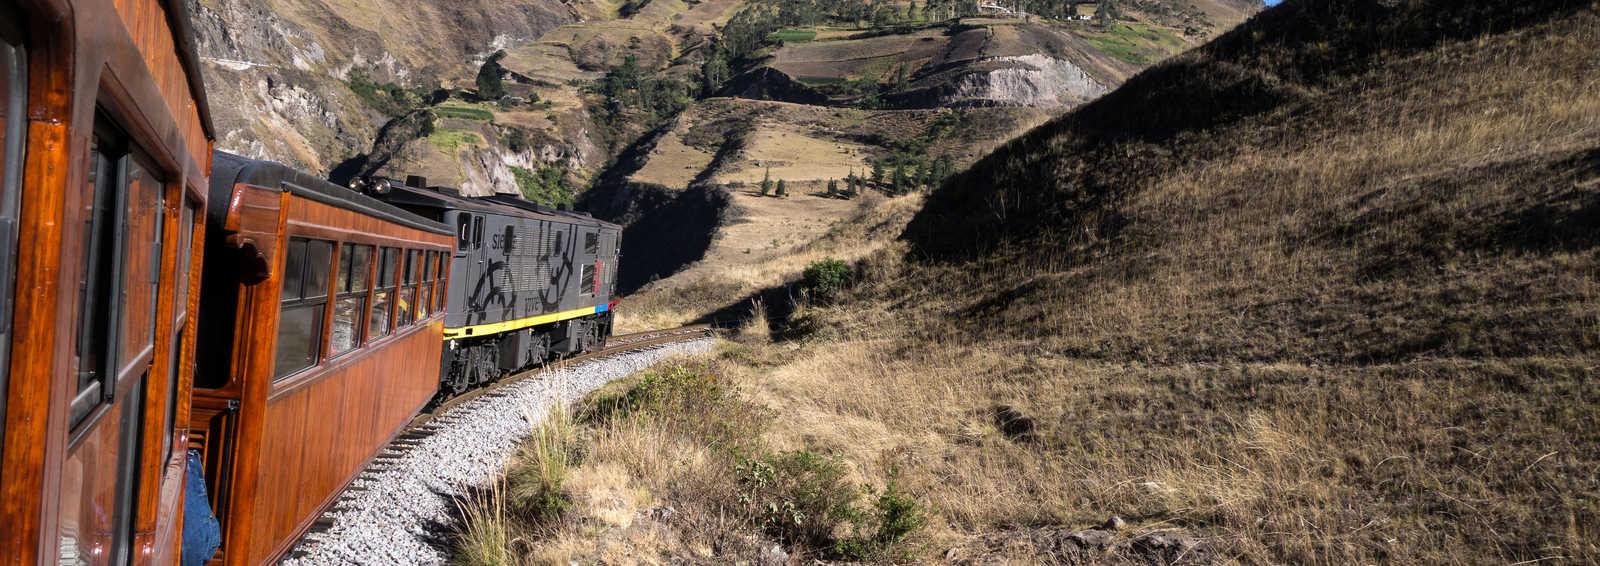 The Devil's Nose train ride, Ecuador